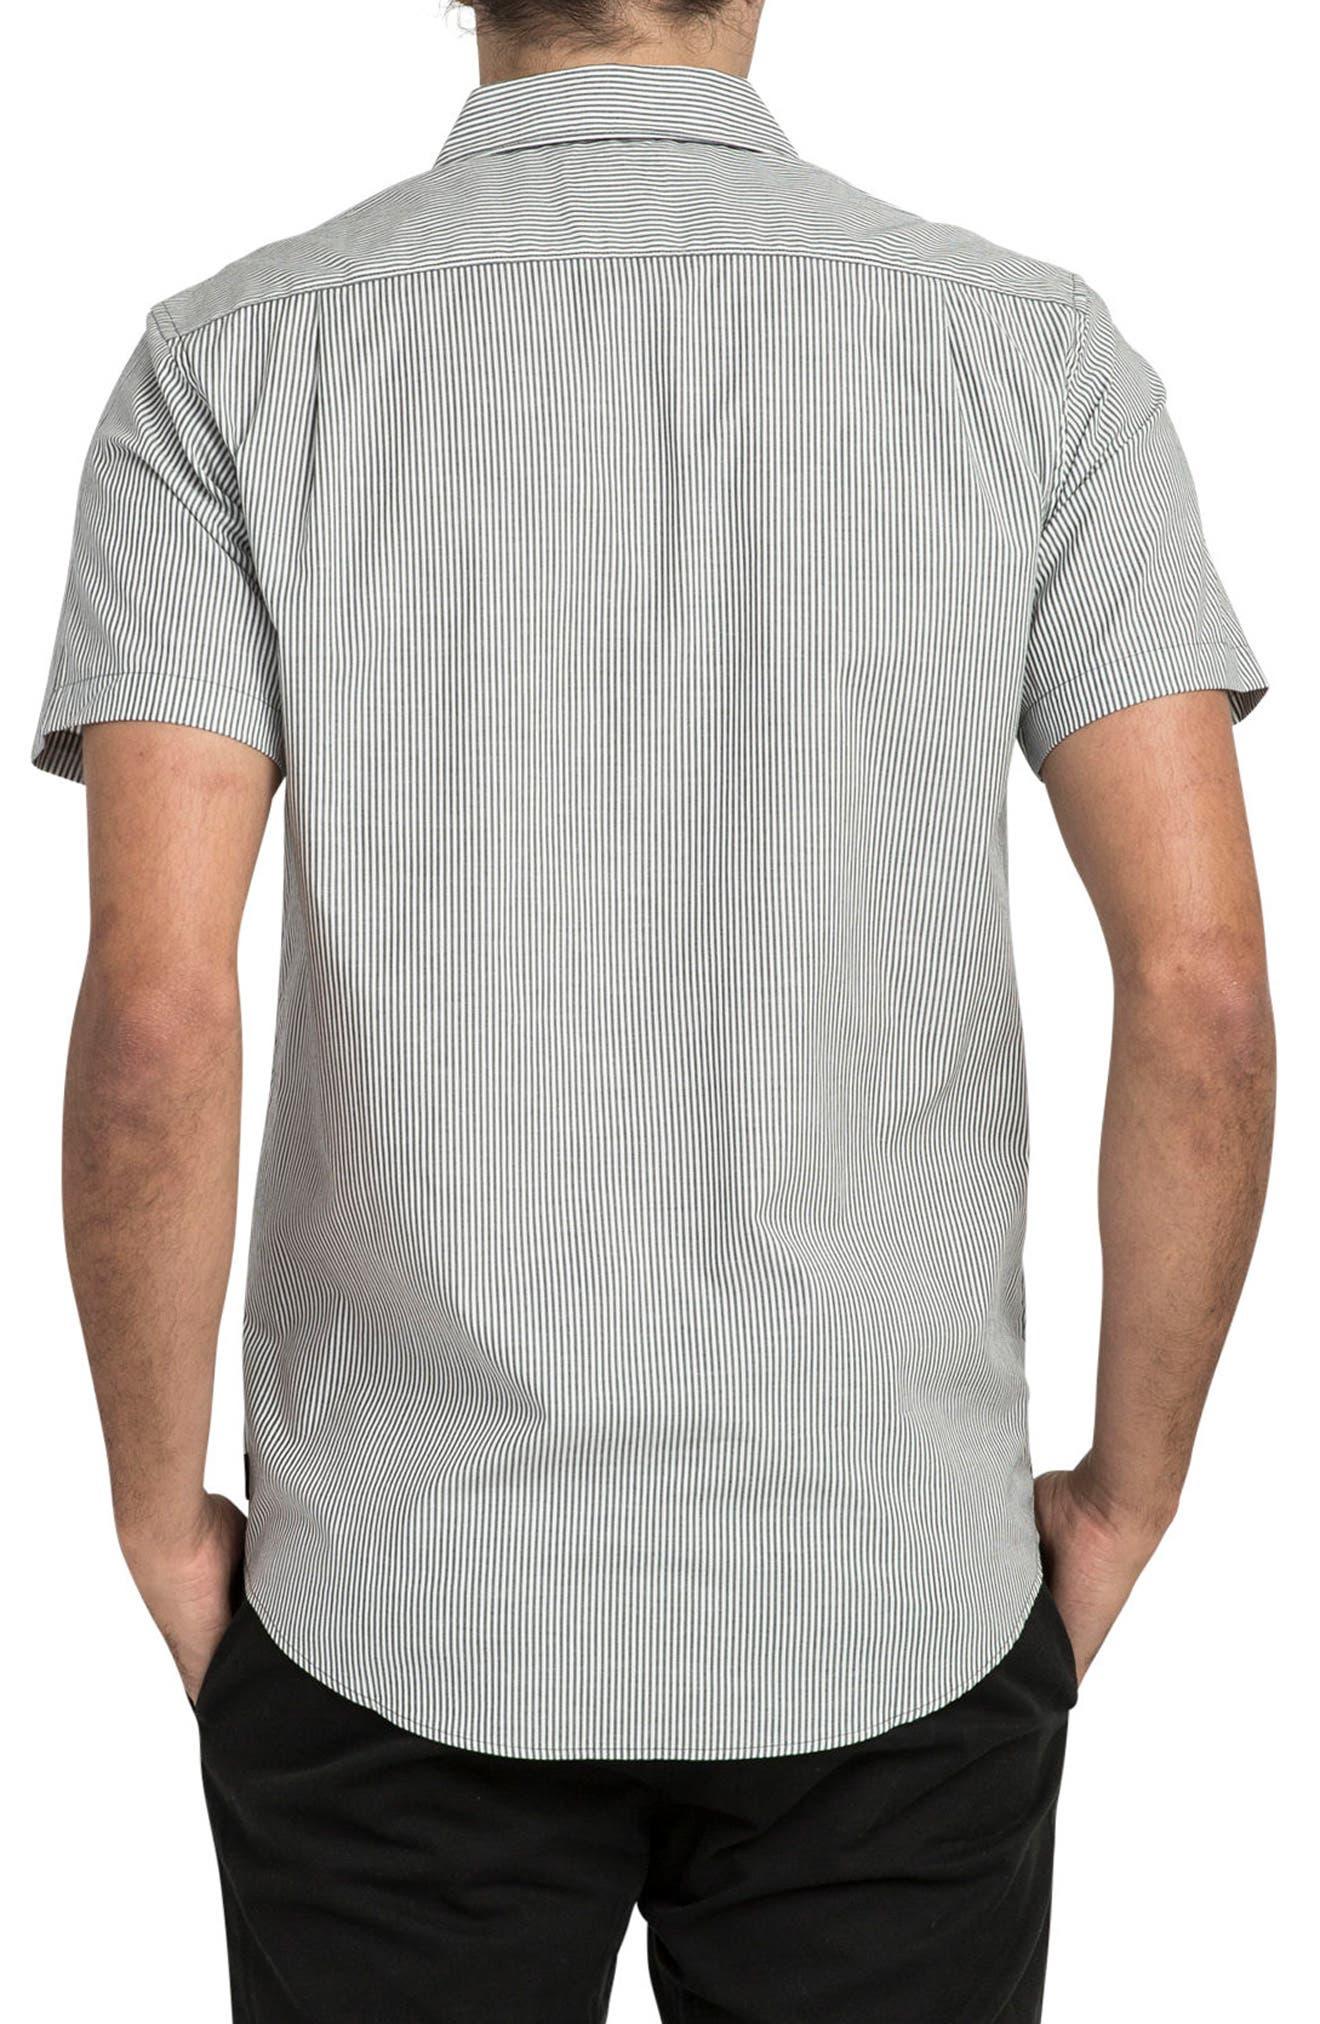 resort Disruption Woven Shirt,                             Alternate thumbnail 2, color,                             001